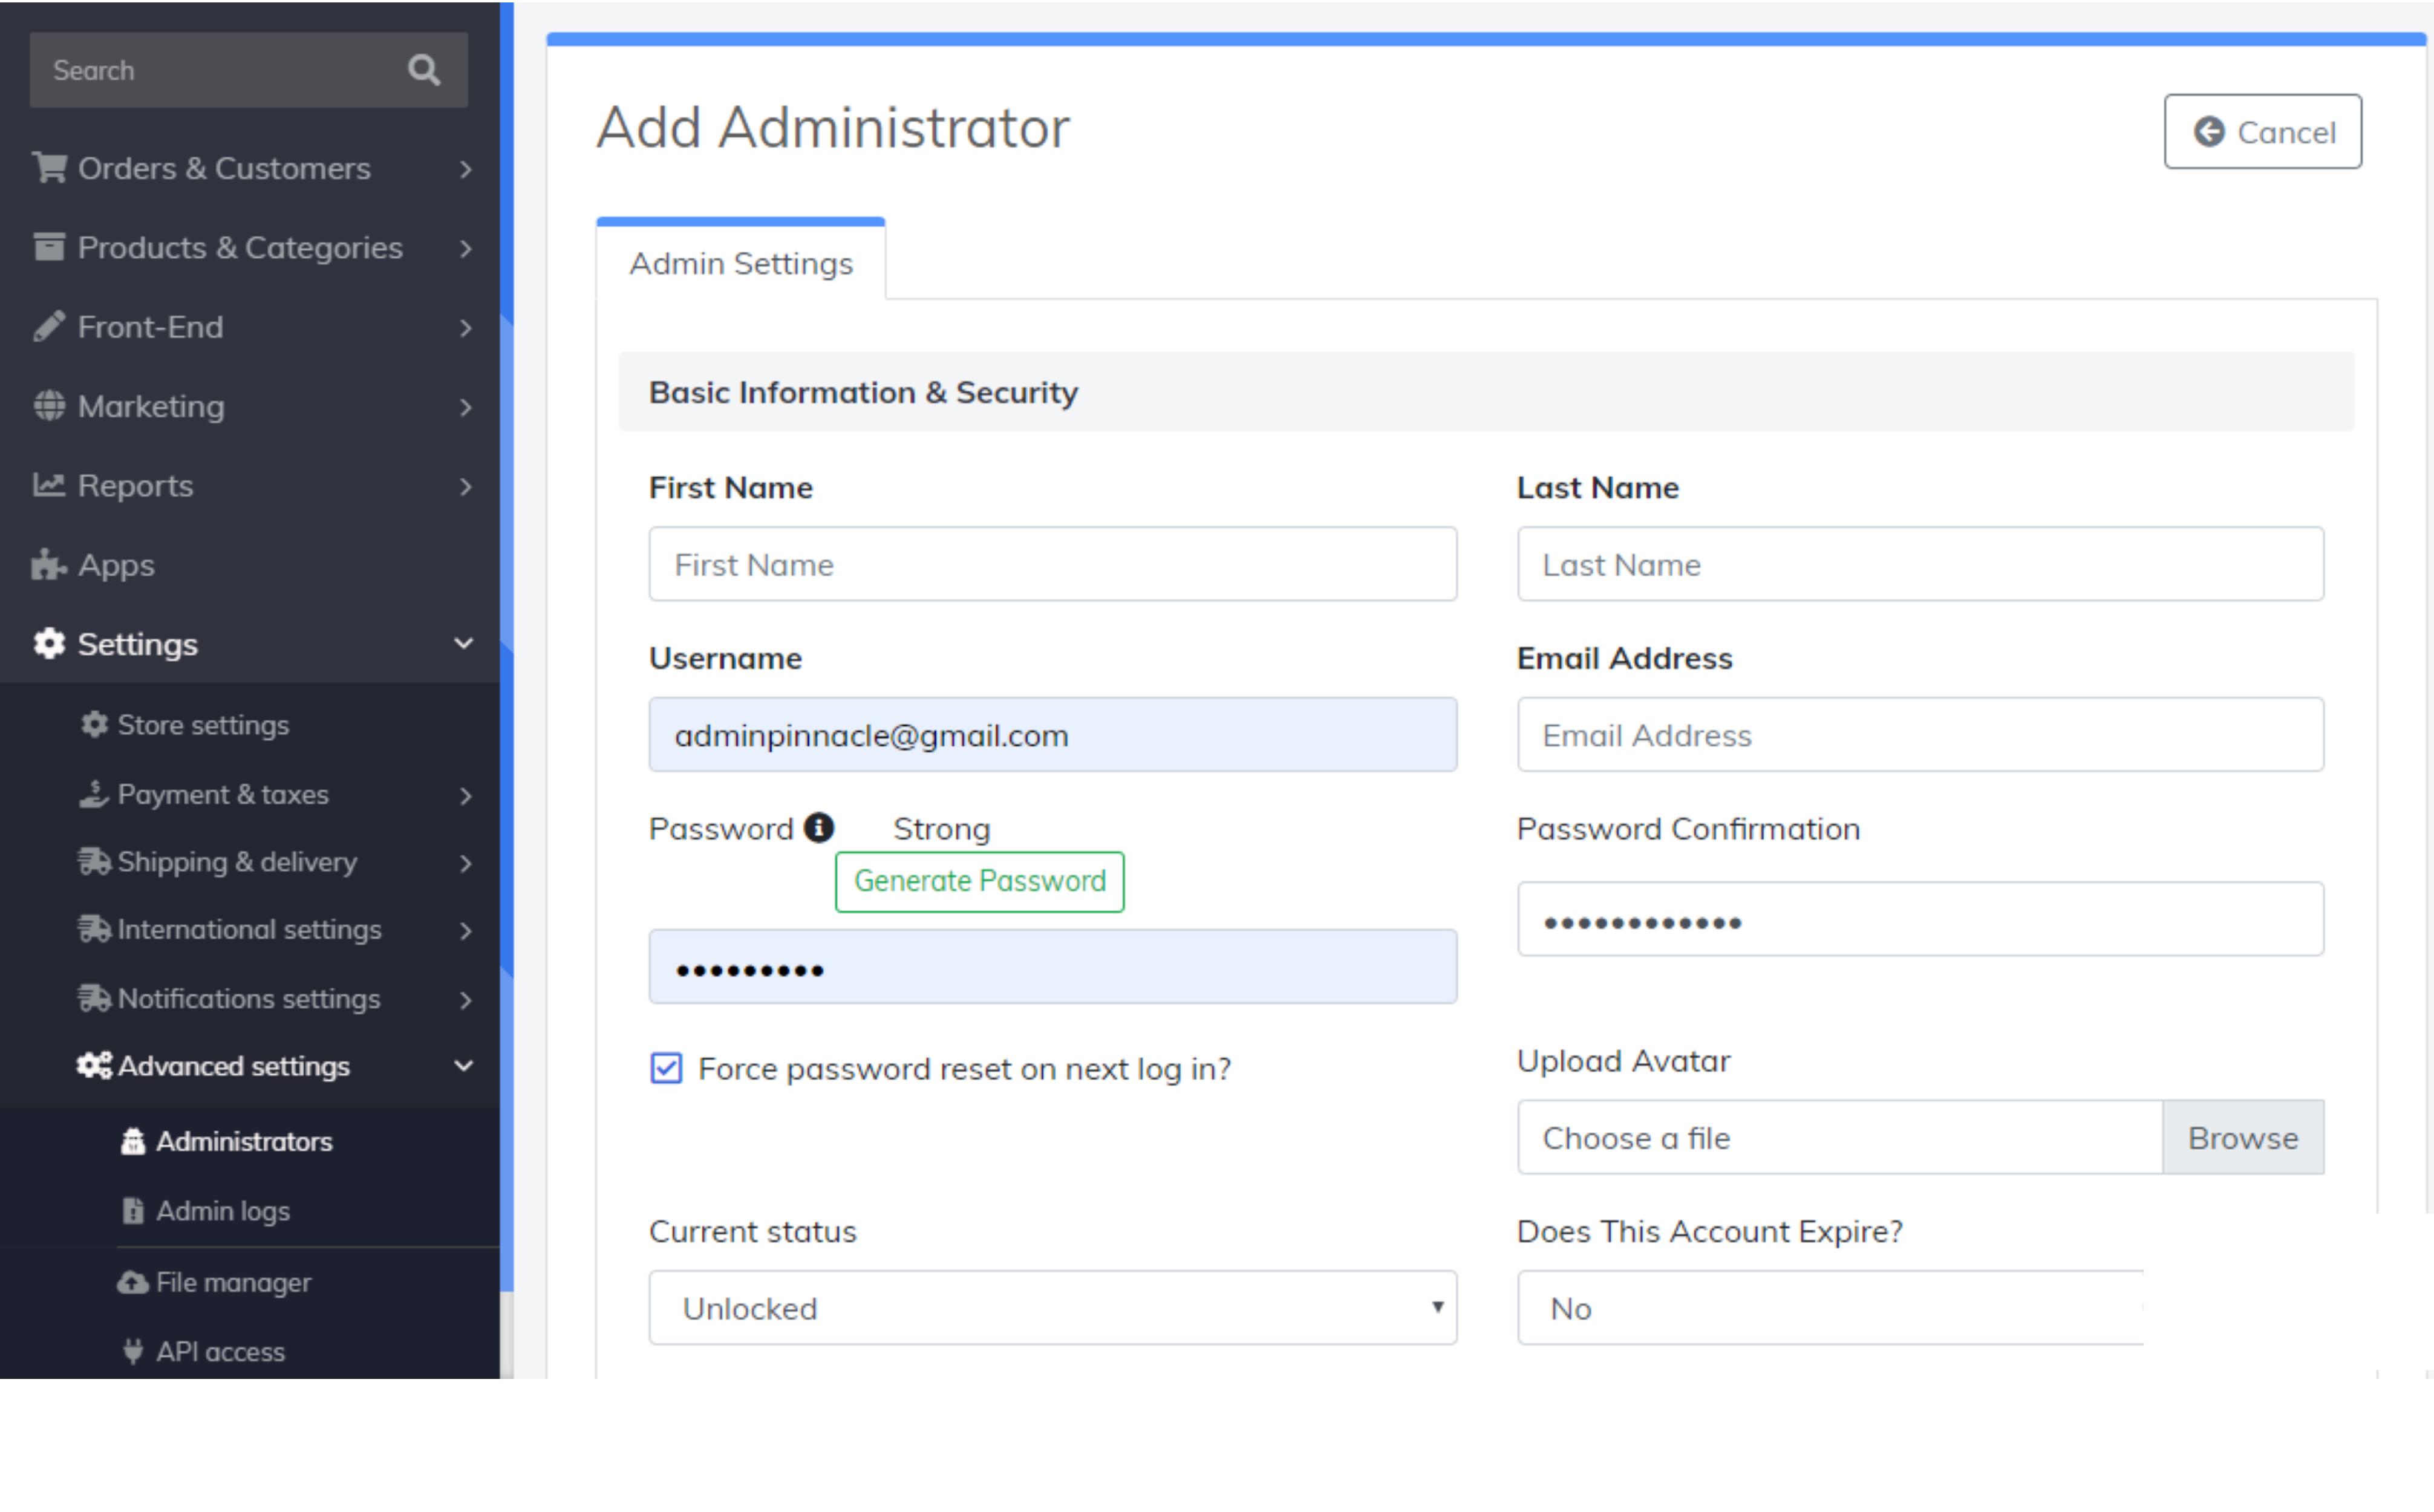 add administrator form